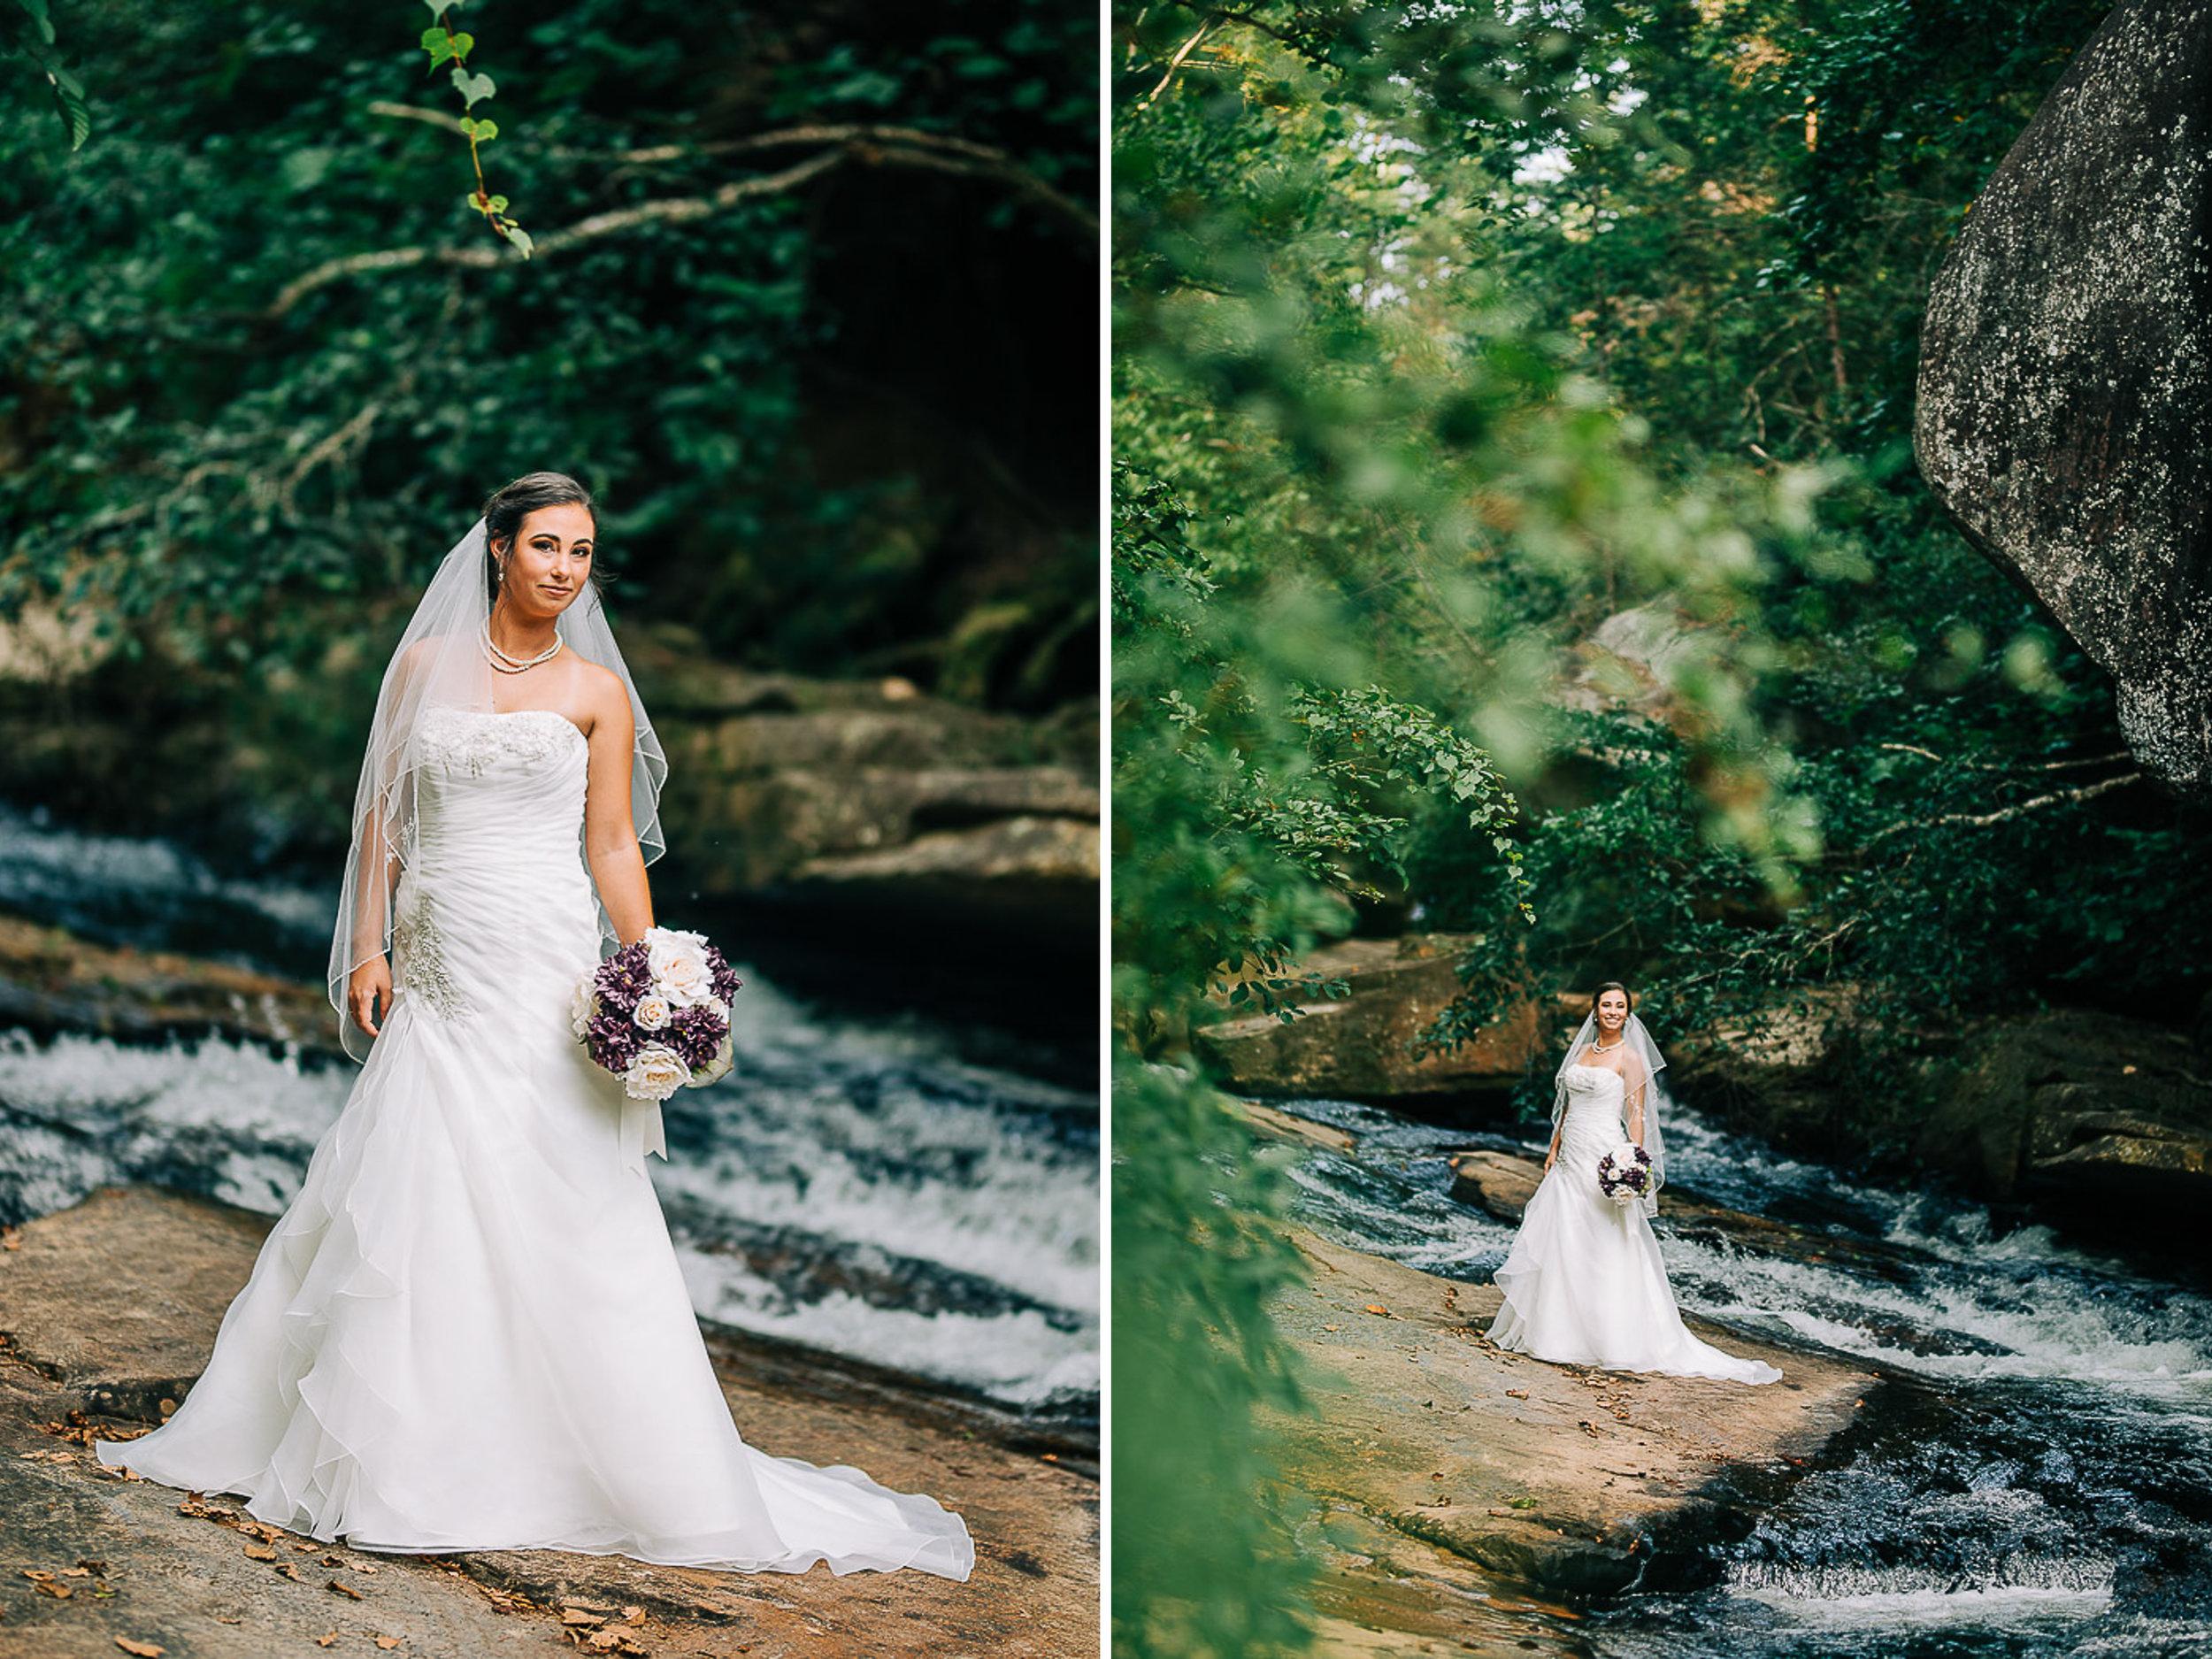 River Bridal Portraits, South Carolina Wedding Photographer, 03.jpg